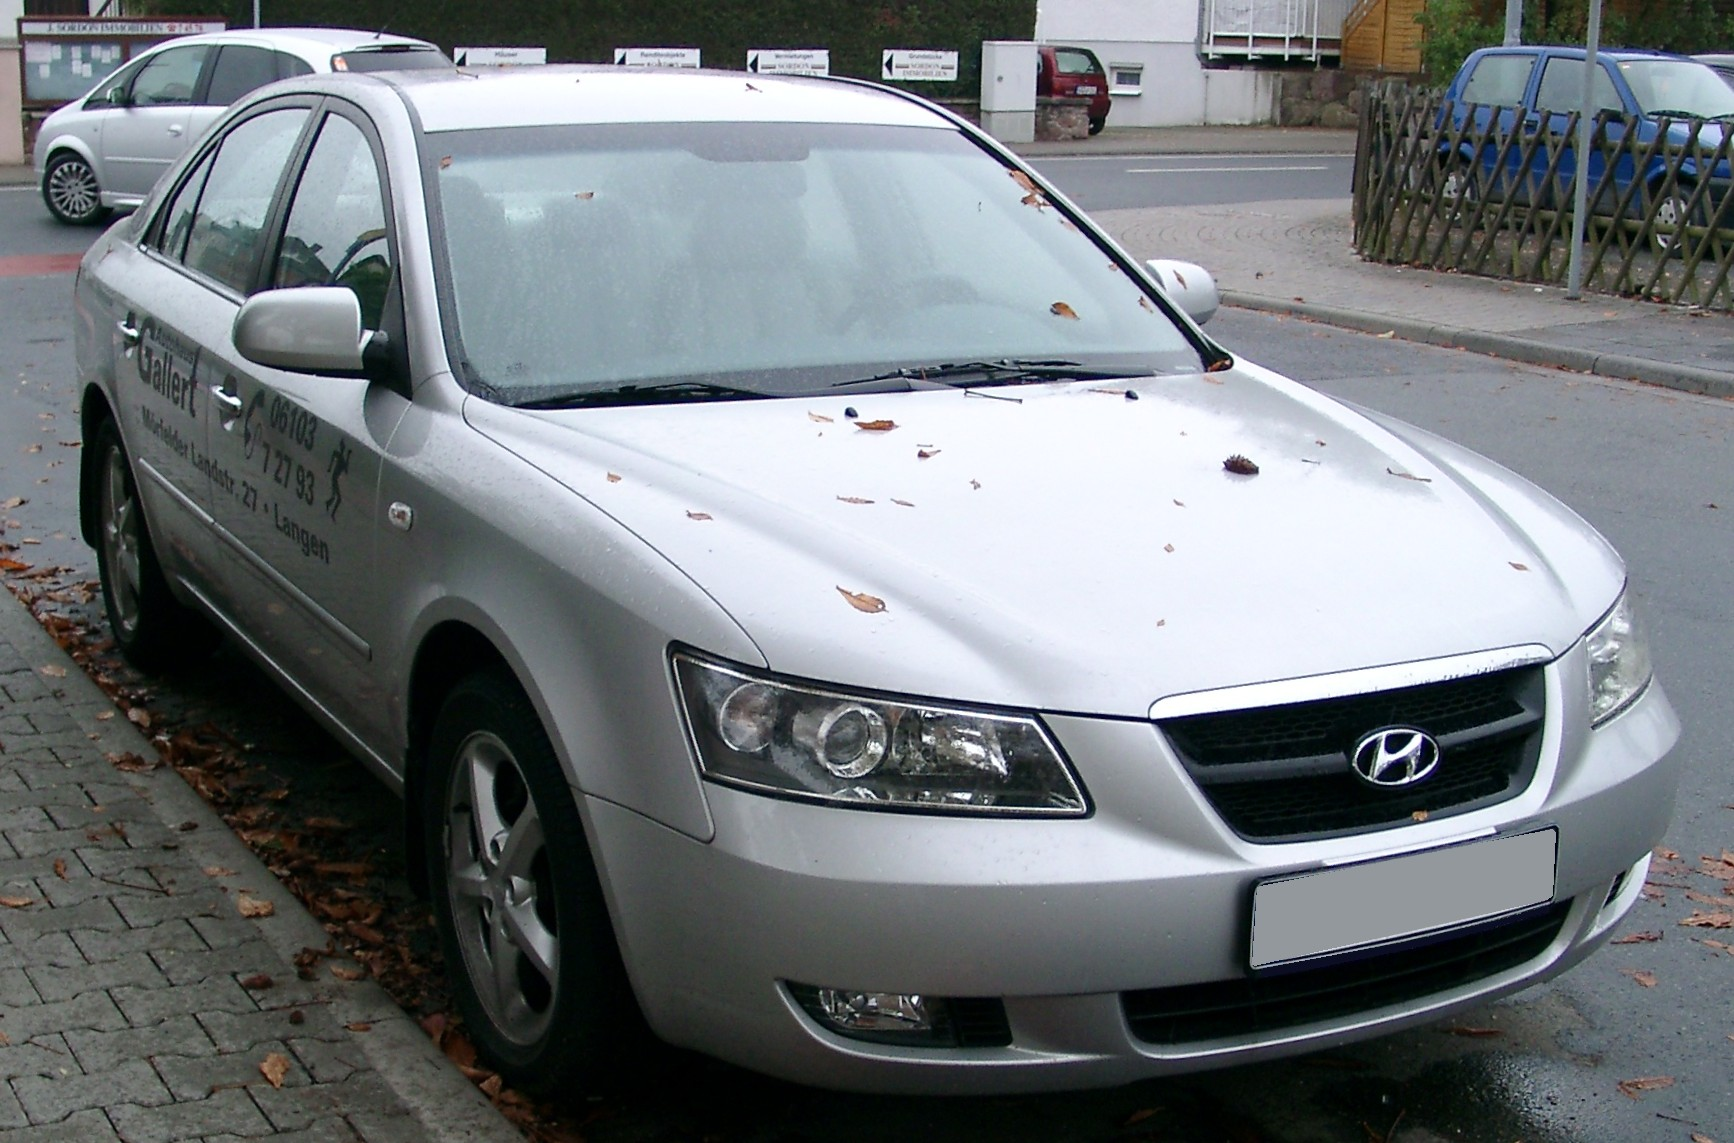 File:Hyundai Sonata front 20070928.jpg - Wikimedia Commons